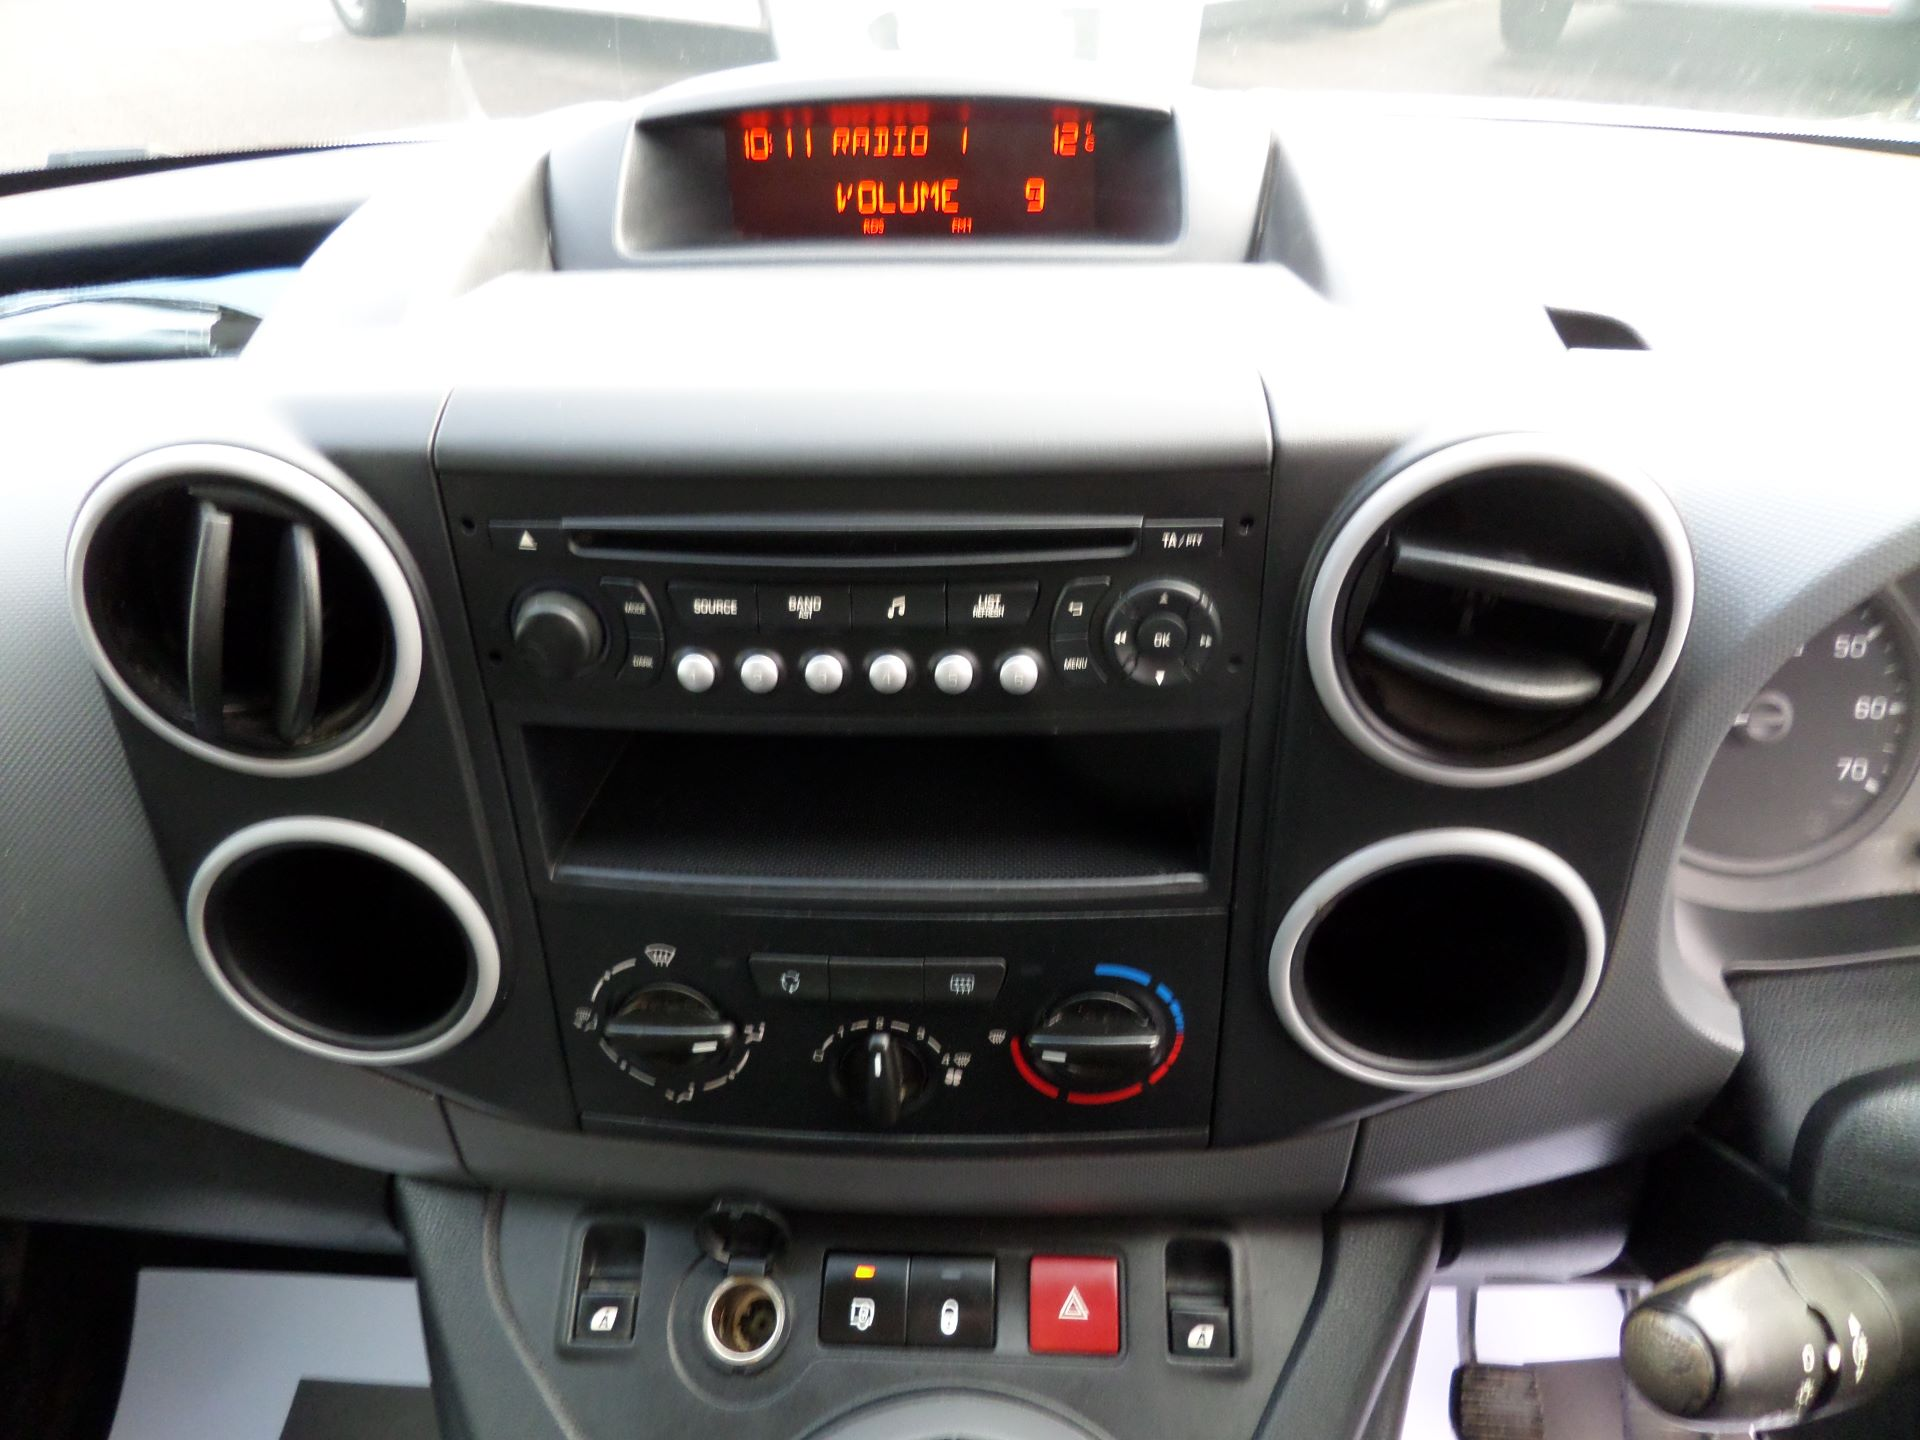 2015 Peugeot Partner 716 S 1.6 Hdi 92 Crew Van Euro 5 (NU65MMX) Image 3